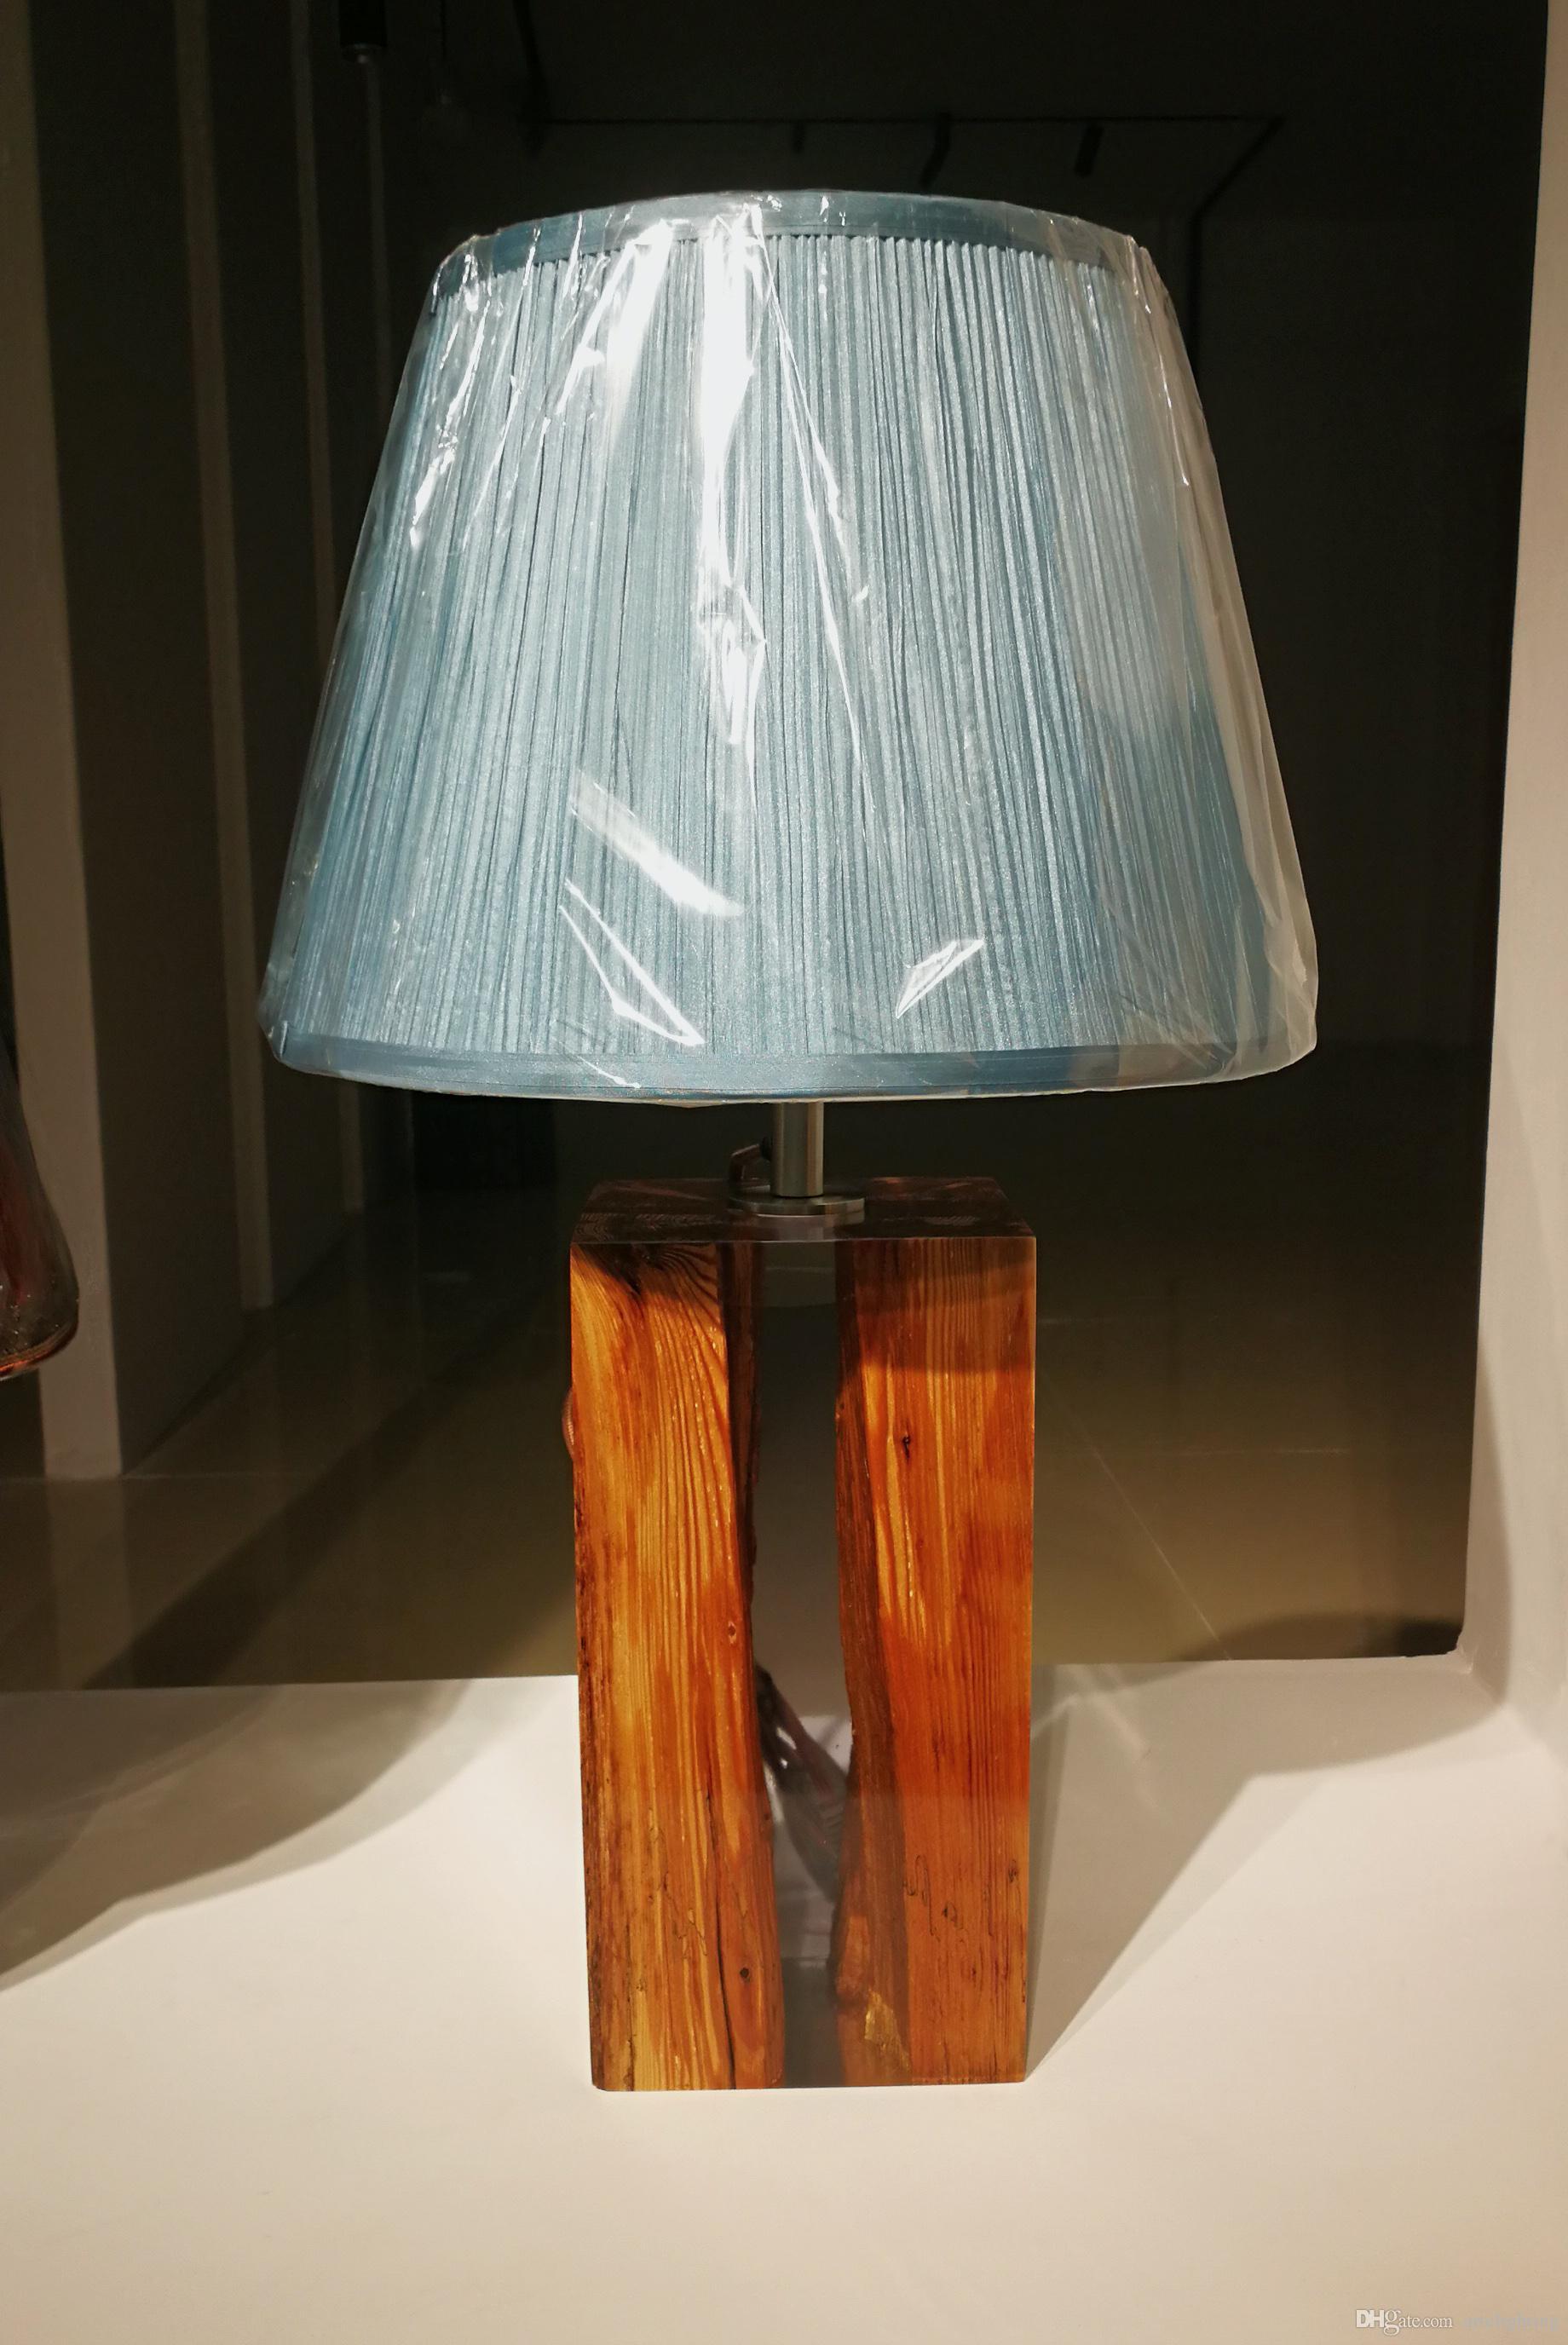 2019 Morden Wood Resin Fluid Lamp Epoxy Light Handmade Wooden Lighting Art Design Idea Highend Interior Home Decor Gallery Gift Furniture Luxury From